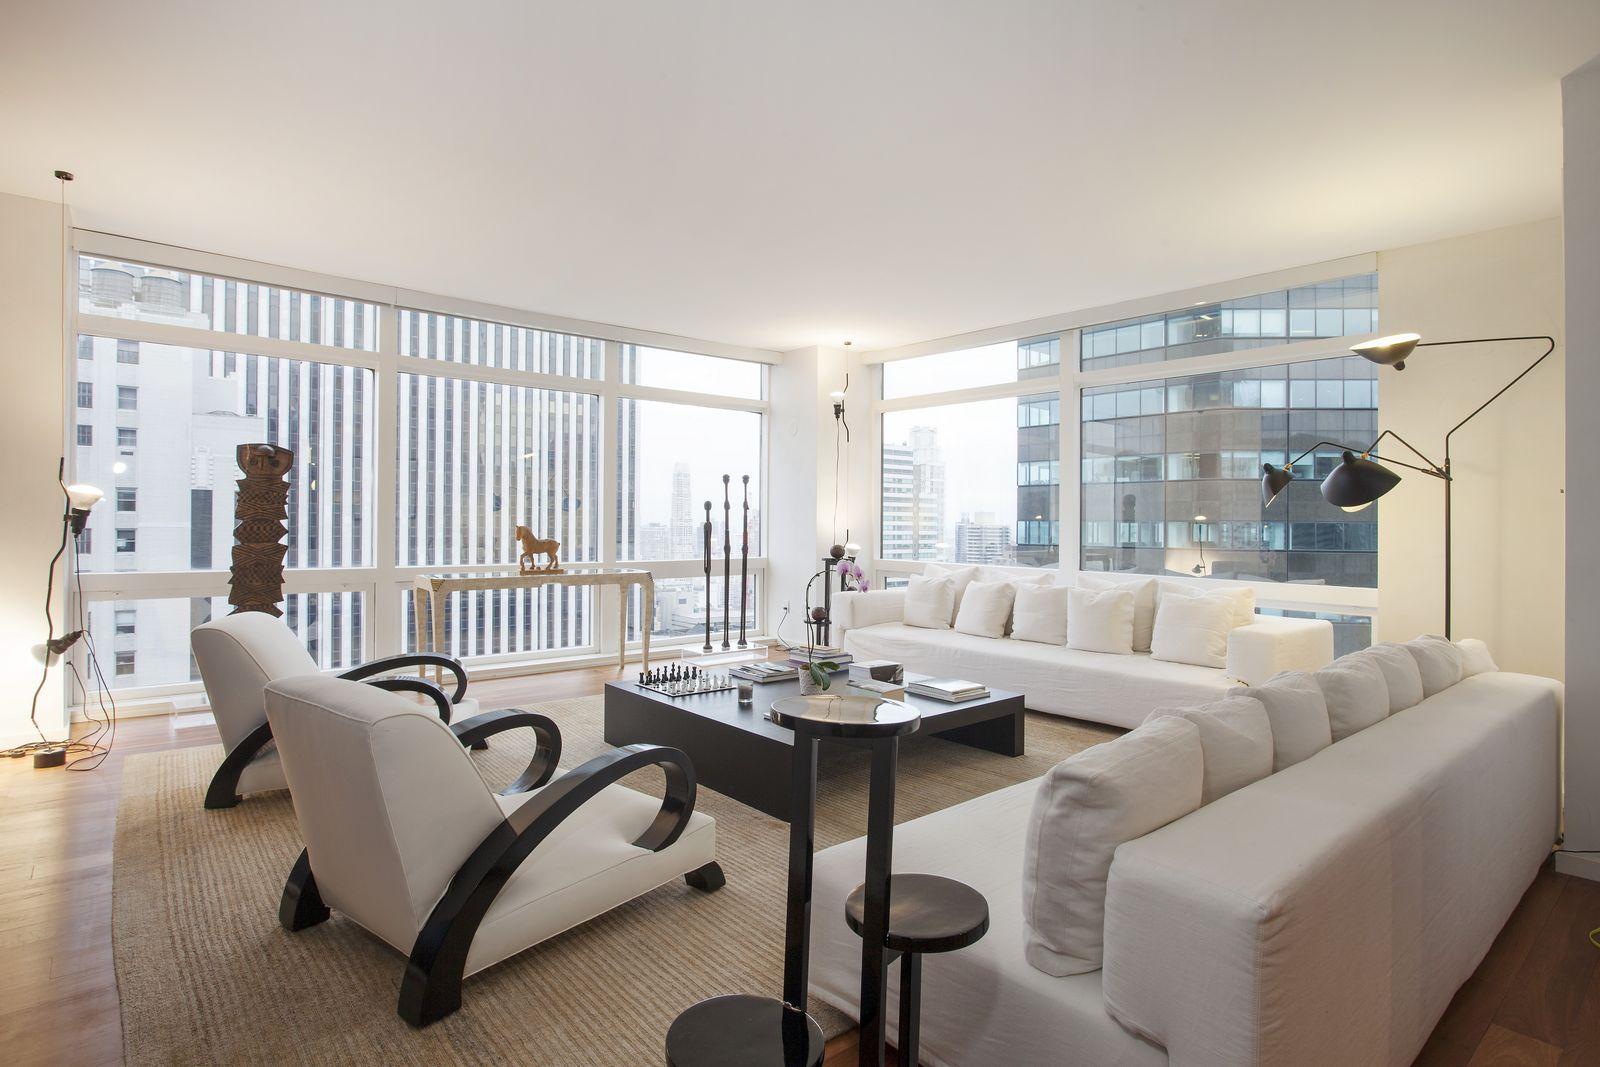 Best Kitchen Gallery: Stunning 10 Million New York City Apartment For Sale Gtspirit of Apartments In New York  on rachelxblog.com